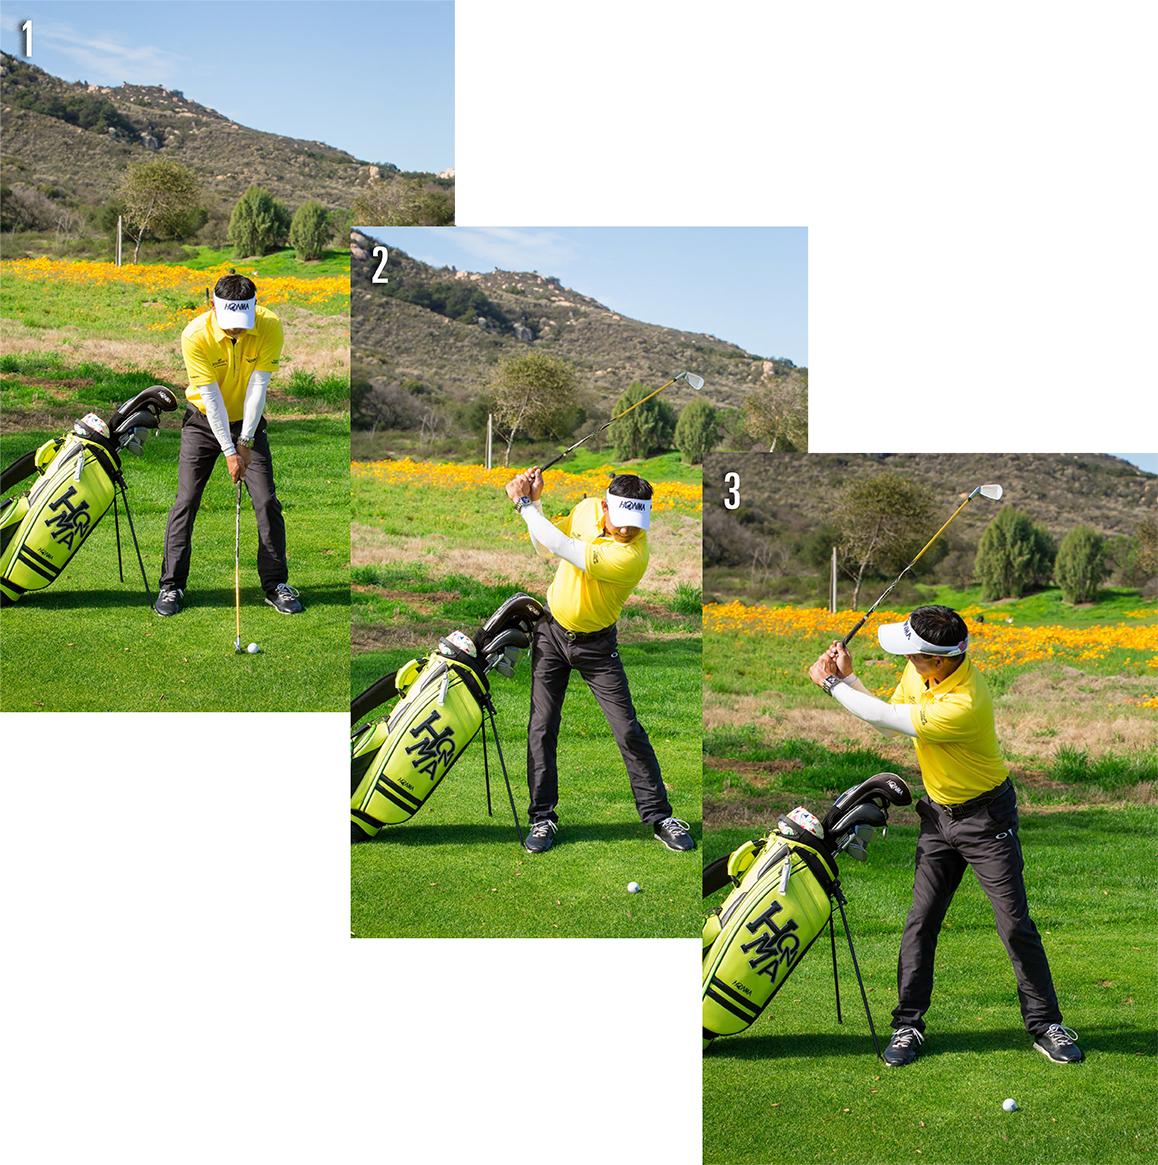 golf bag into a training aid 1-3